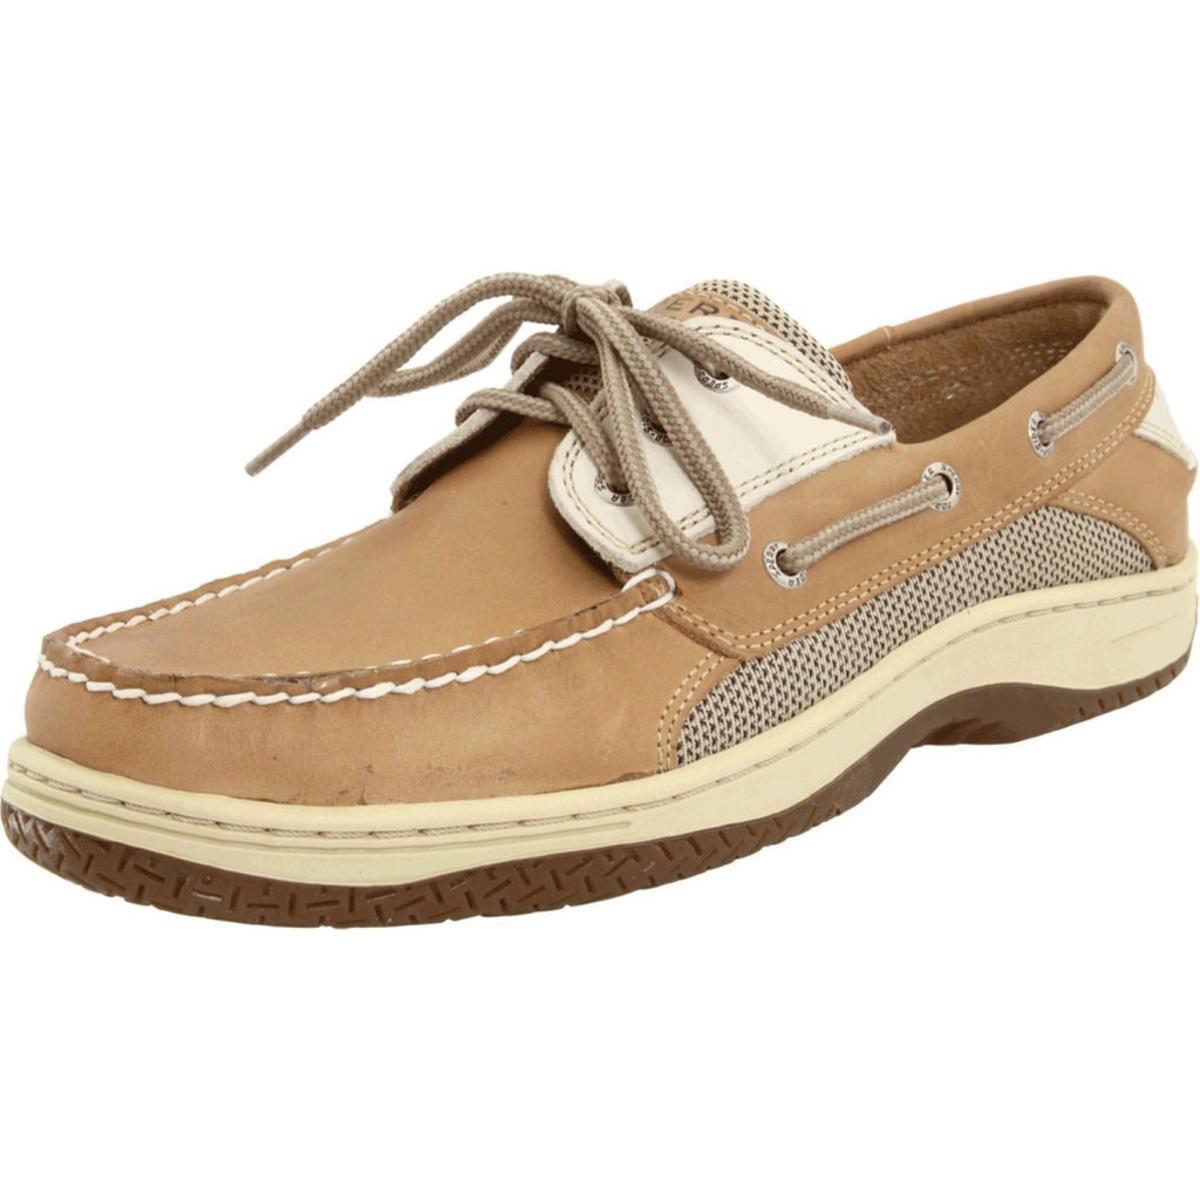 Sperry Top-Sider Billfish 3-eye Men's Tan Beige Boat shoes